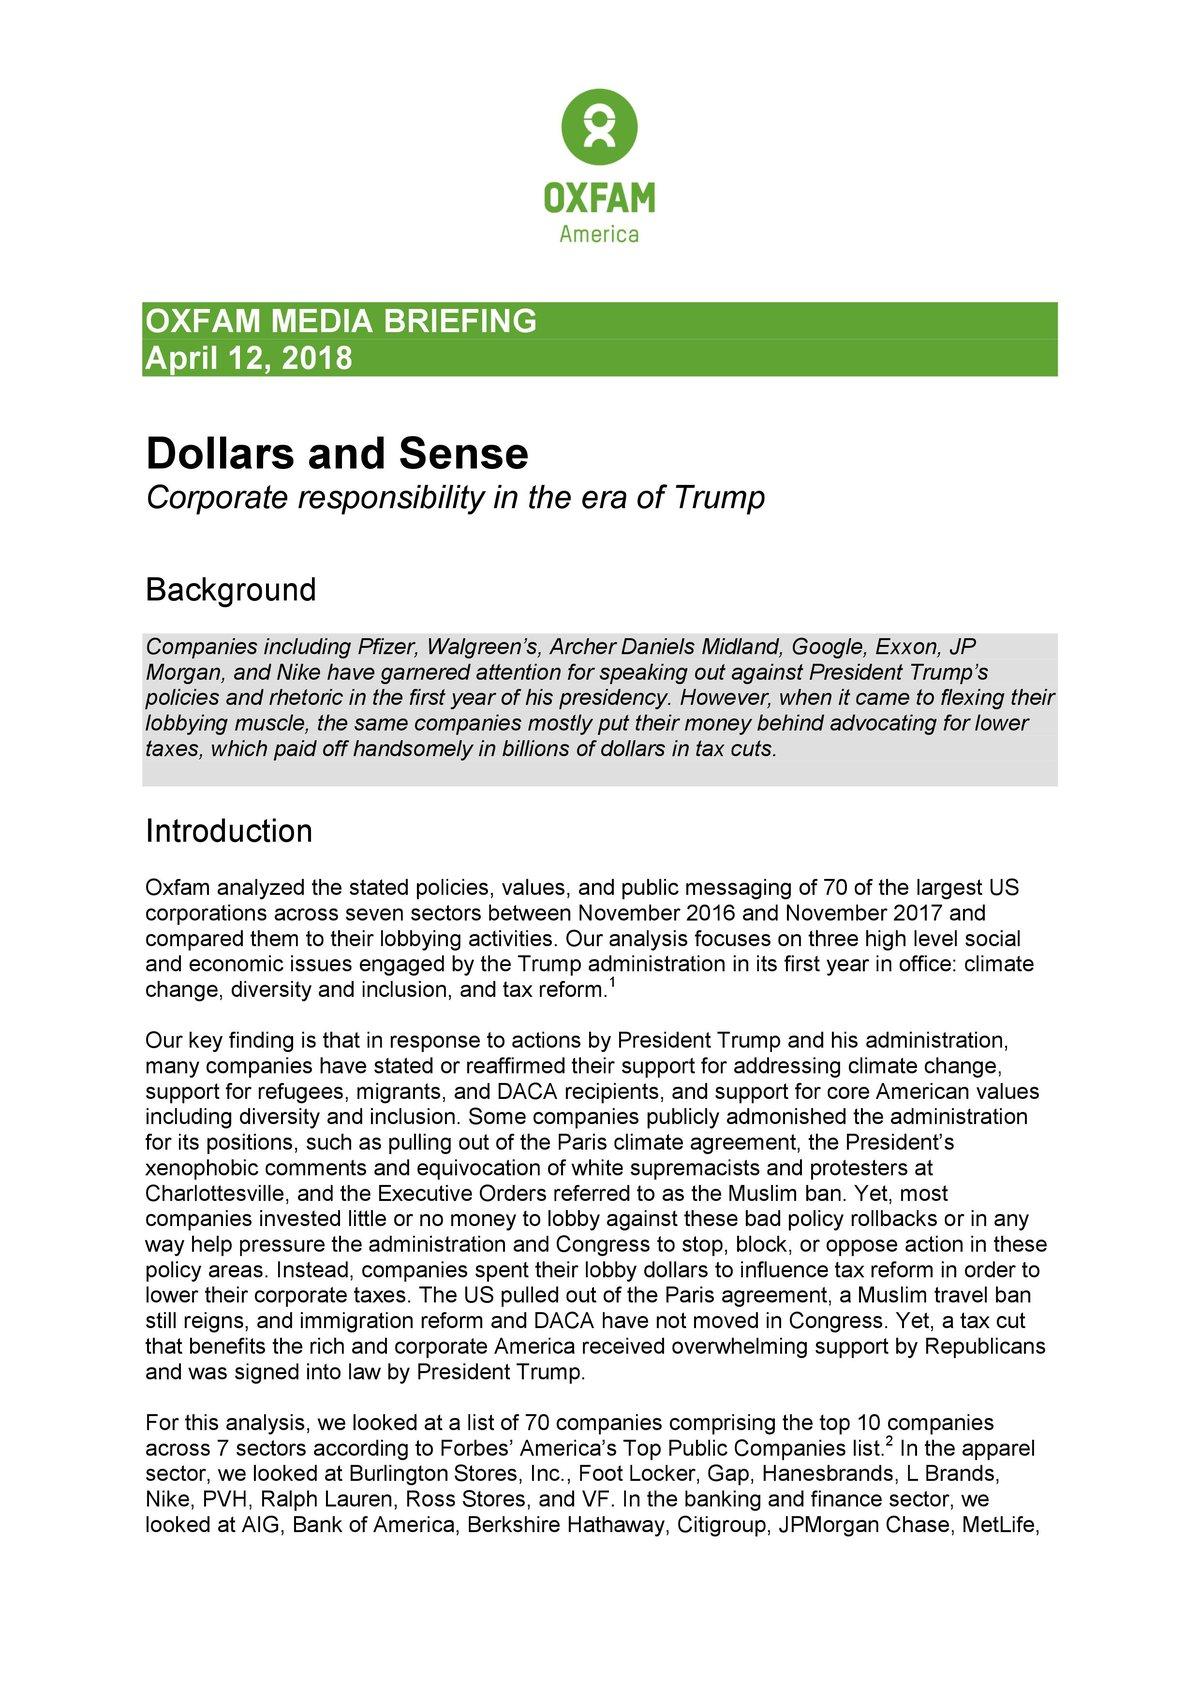 Dollars and Sense | Oxfam